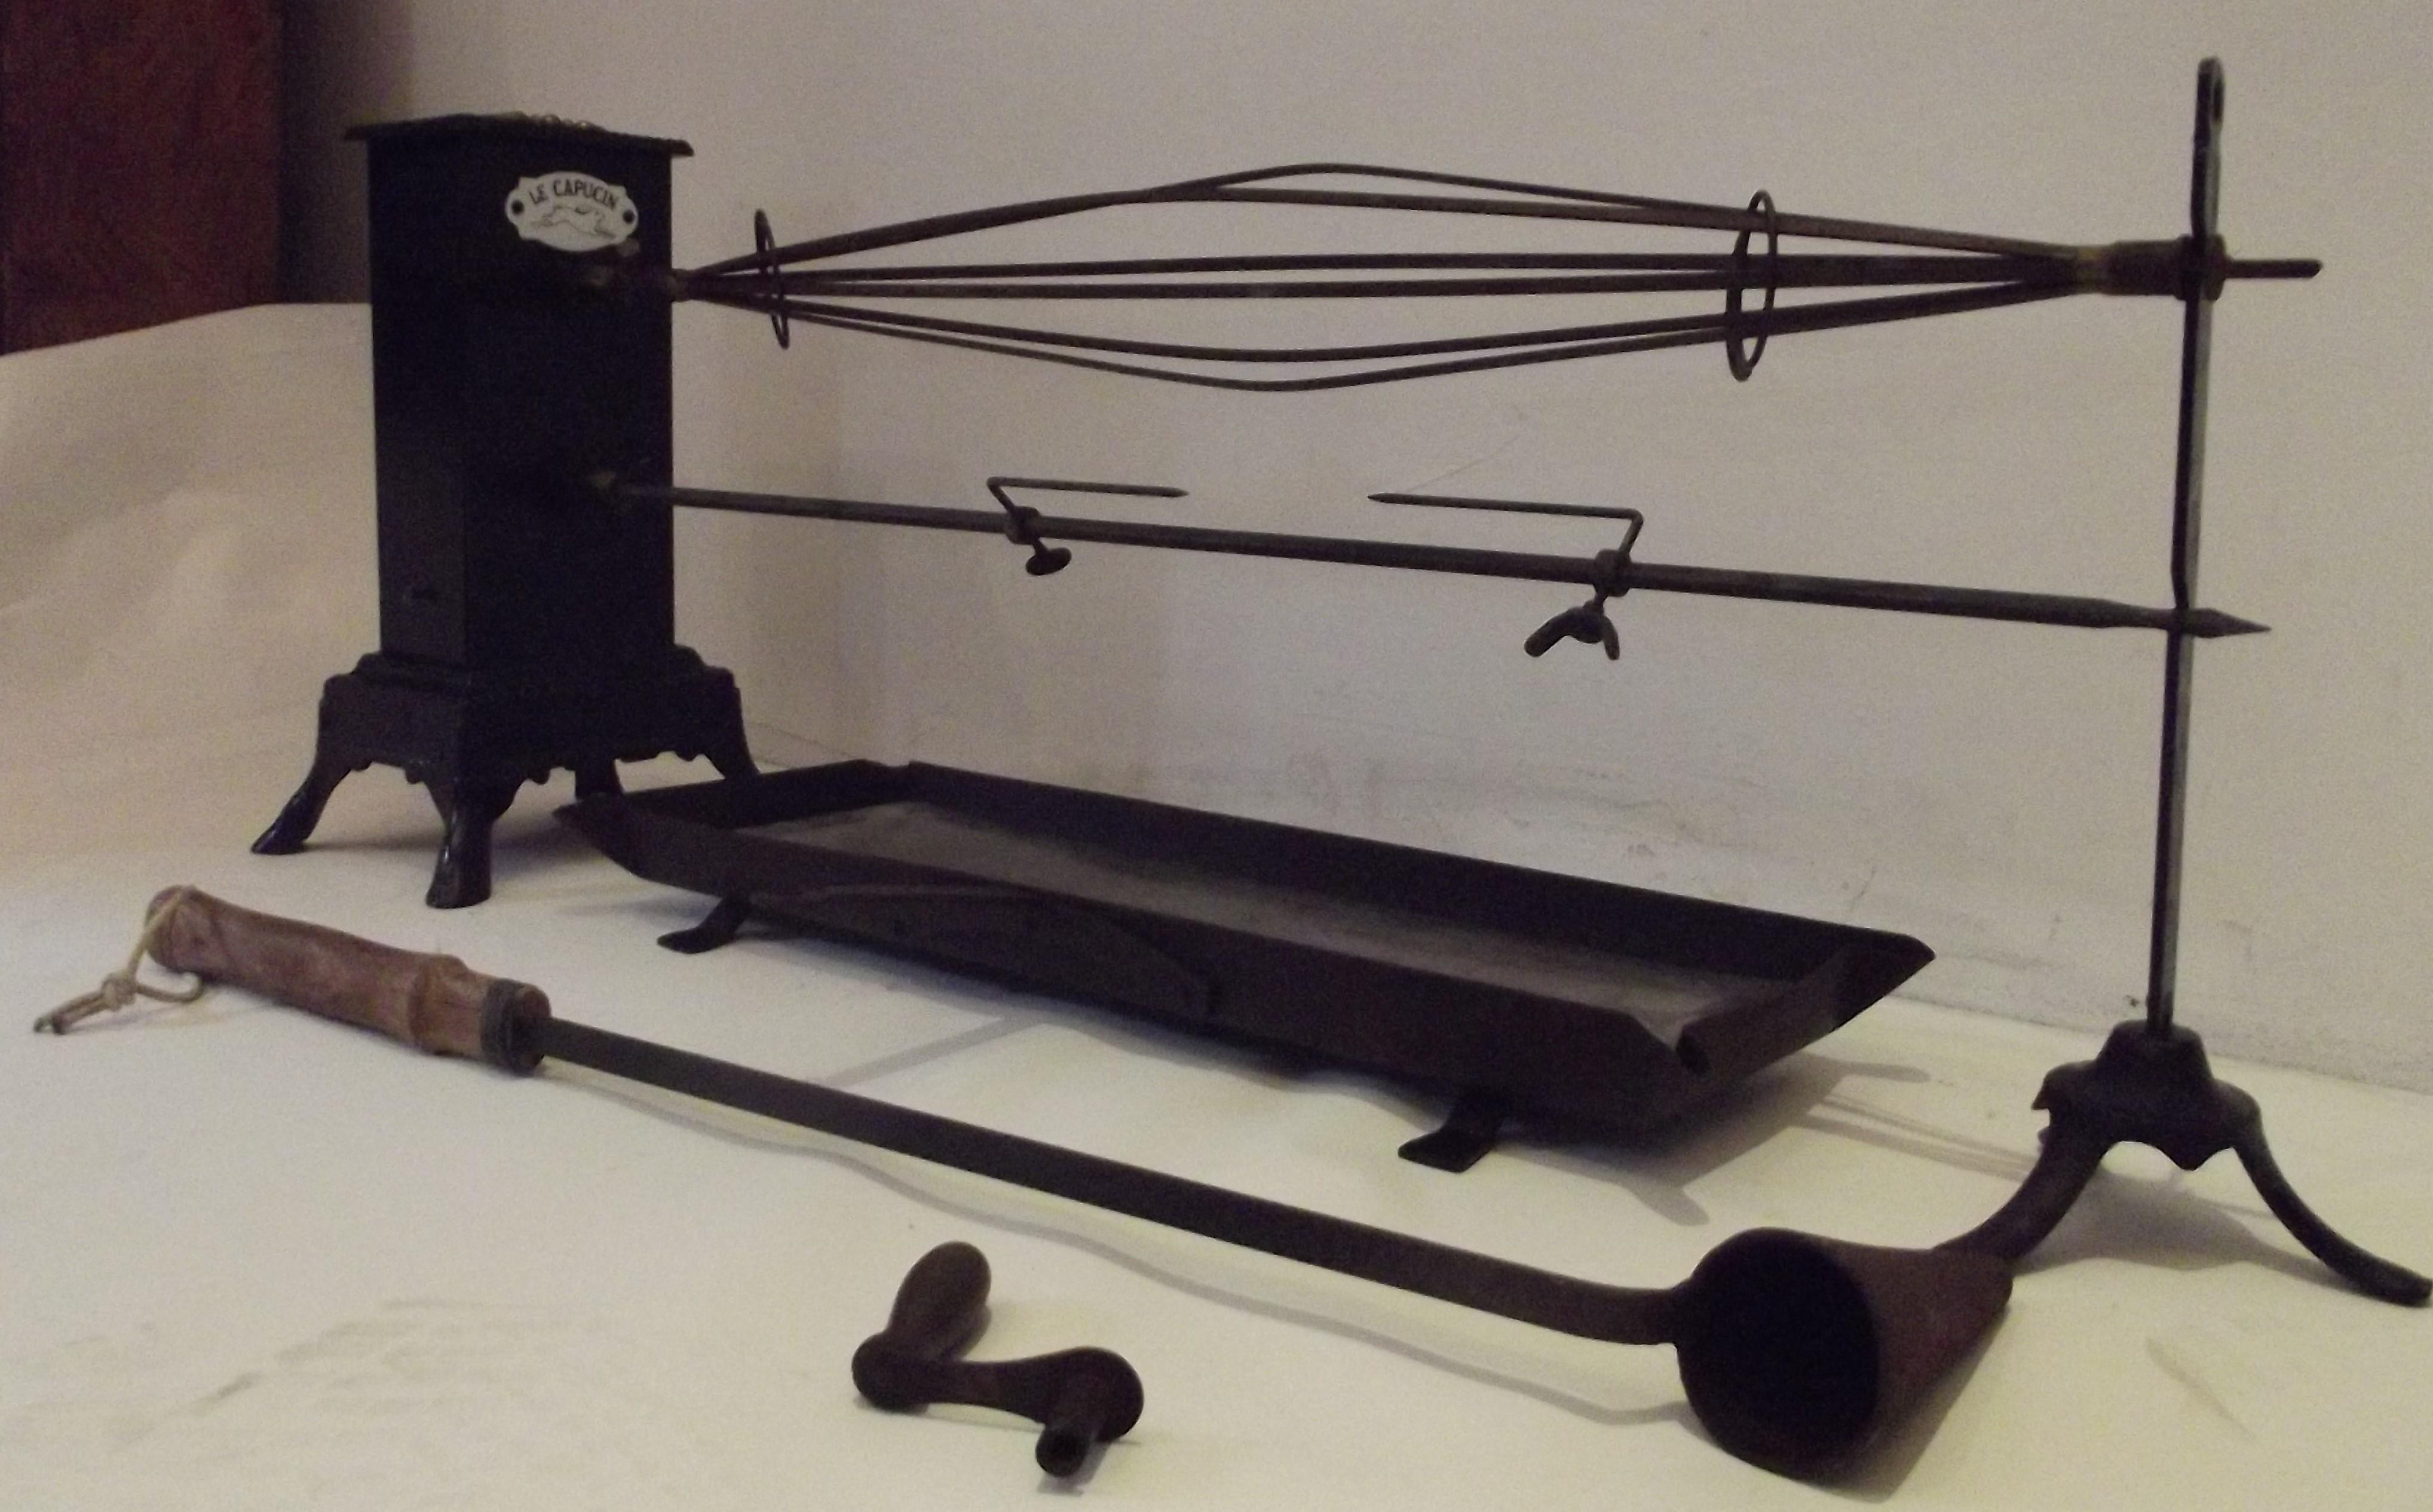 tourne broche mecanique neuf ustensiles de cuisine. Black Bedroom Furniture Sets. Home Design Ideas